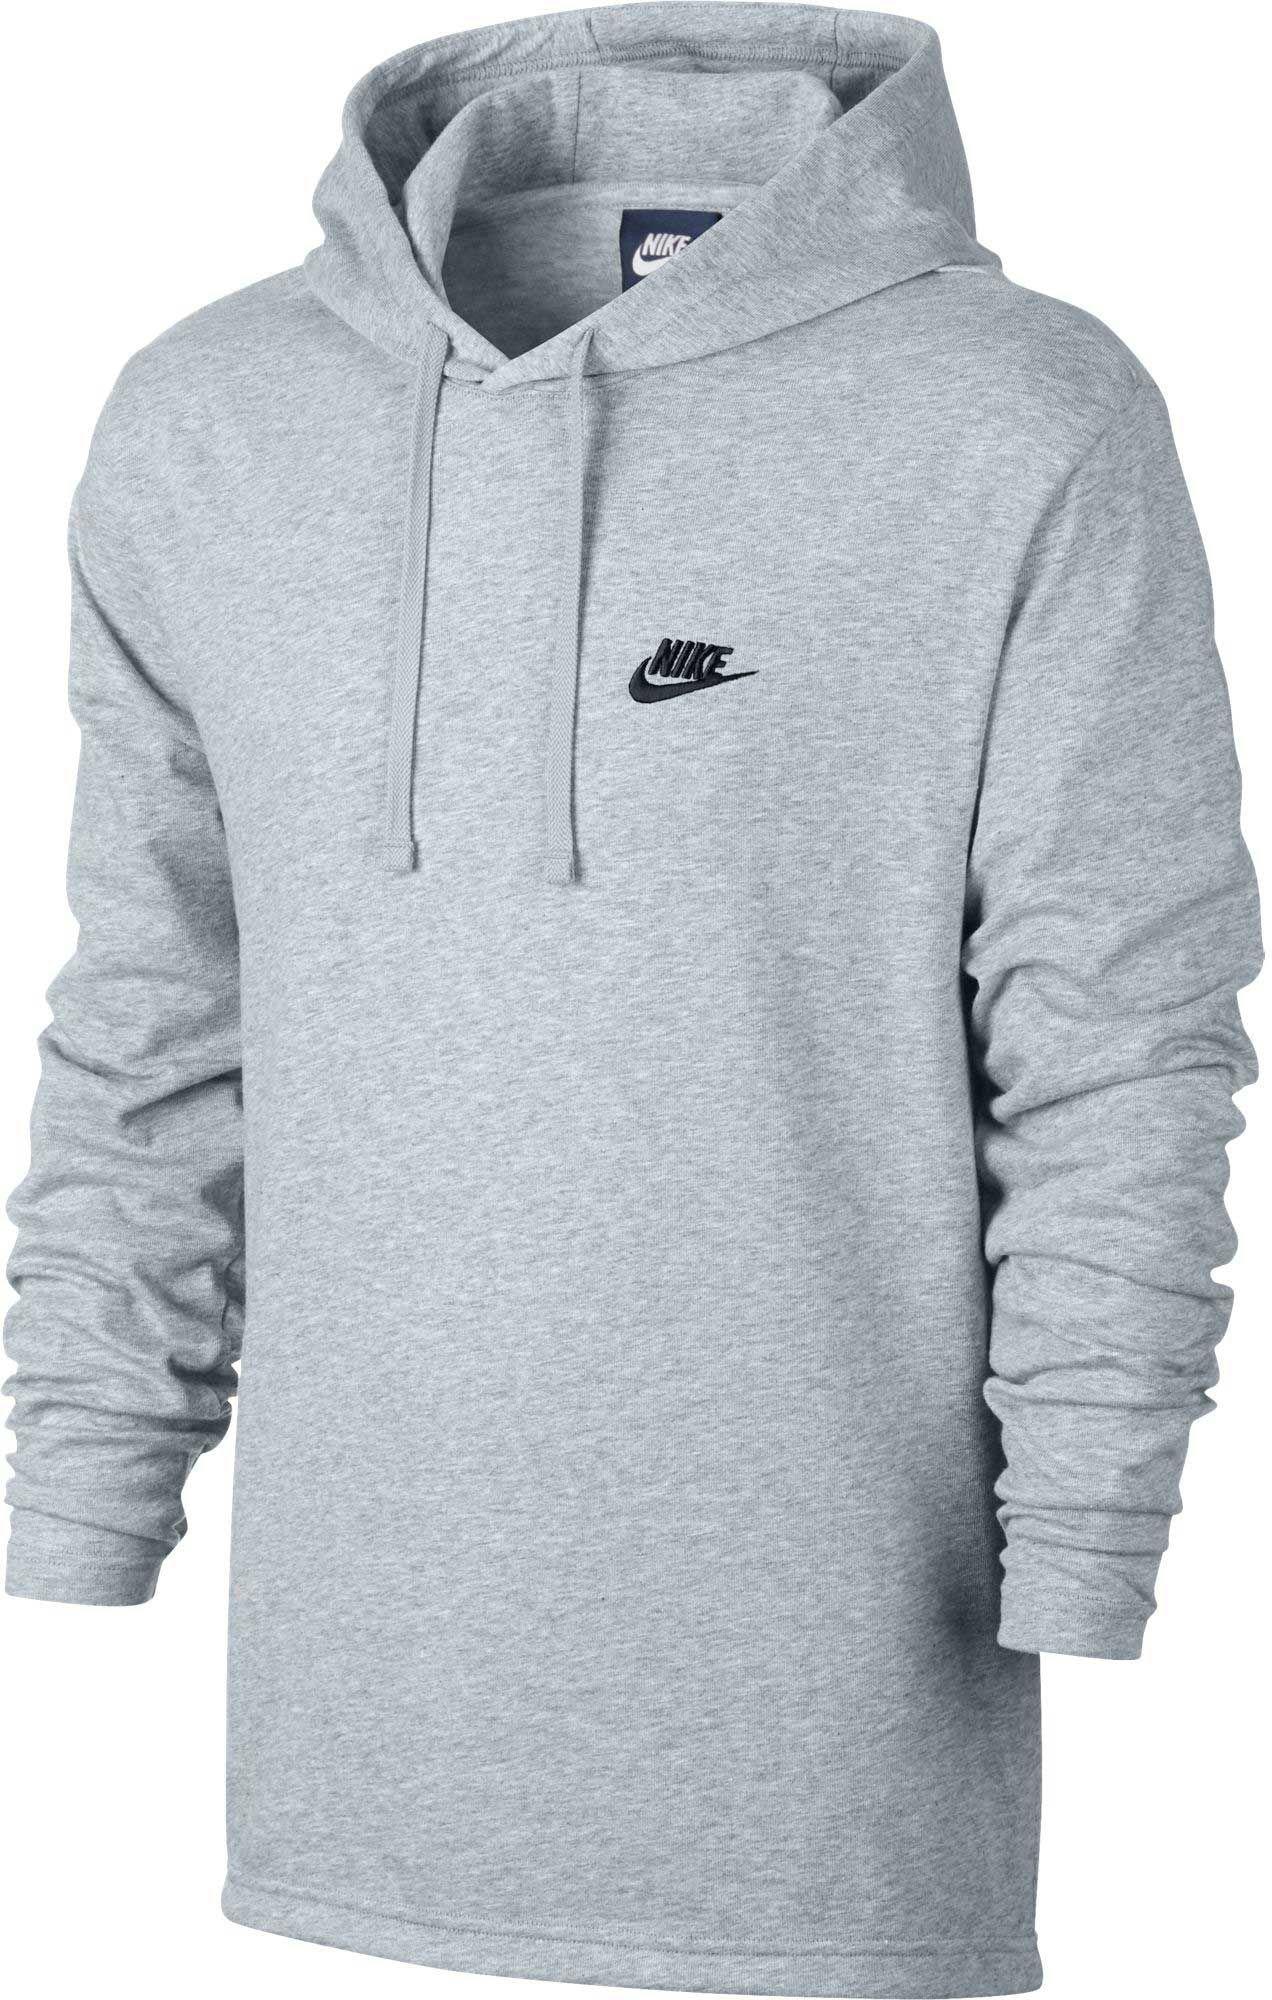 e560417df044d Nike Men's Jersey Lightweight Pullover Hoodie, Size: Medium, Birch Heather/ Black. Nike Men's Sportswear Club ...